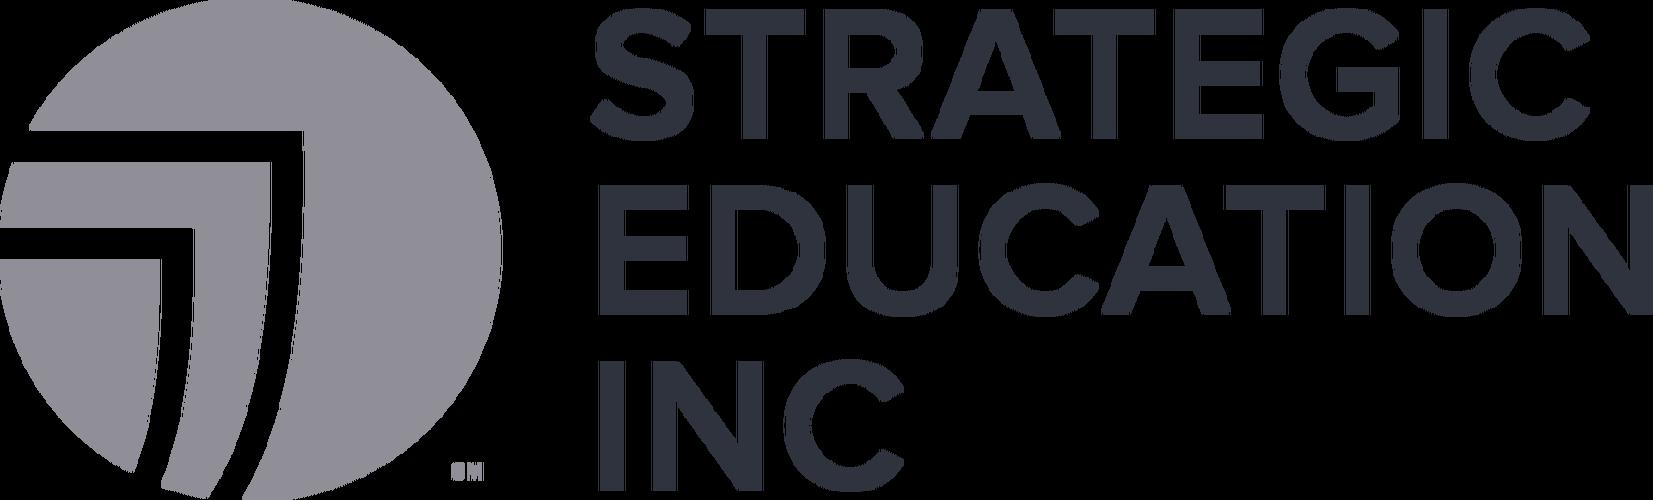 Strategic Education, Inc.